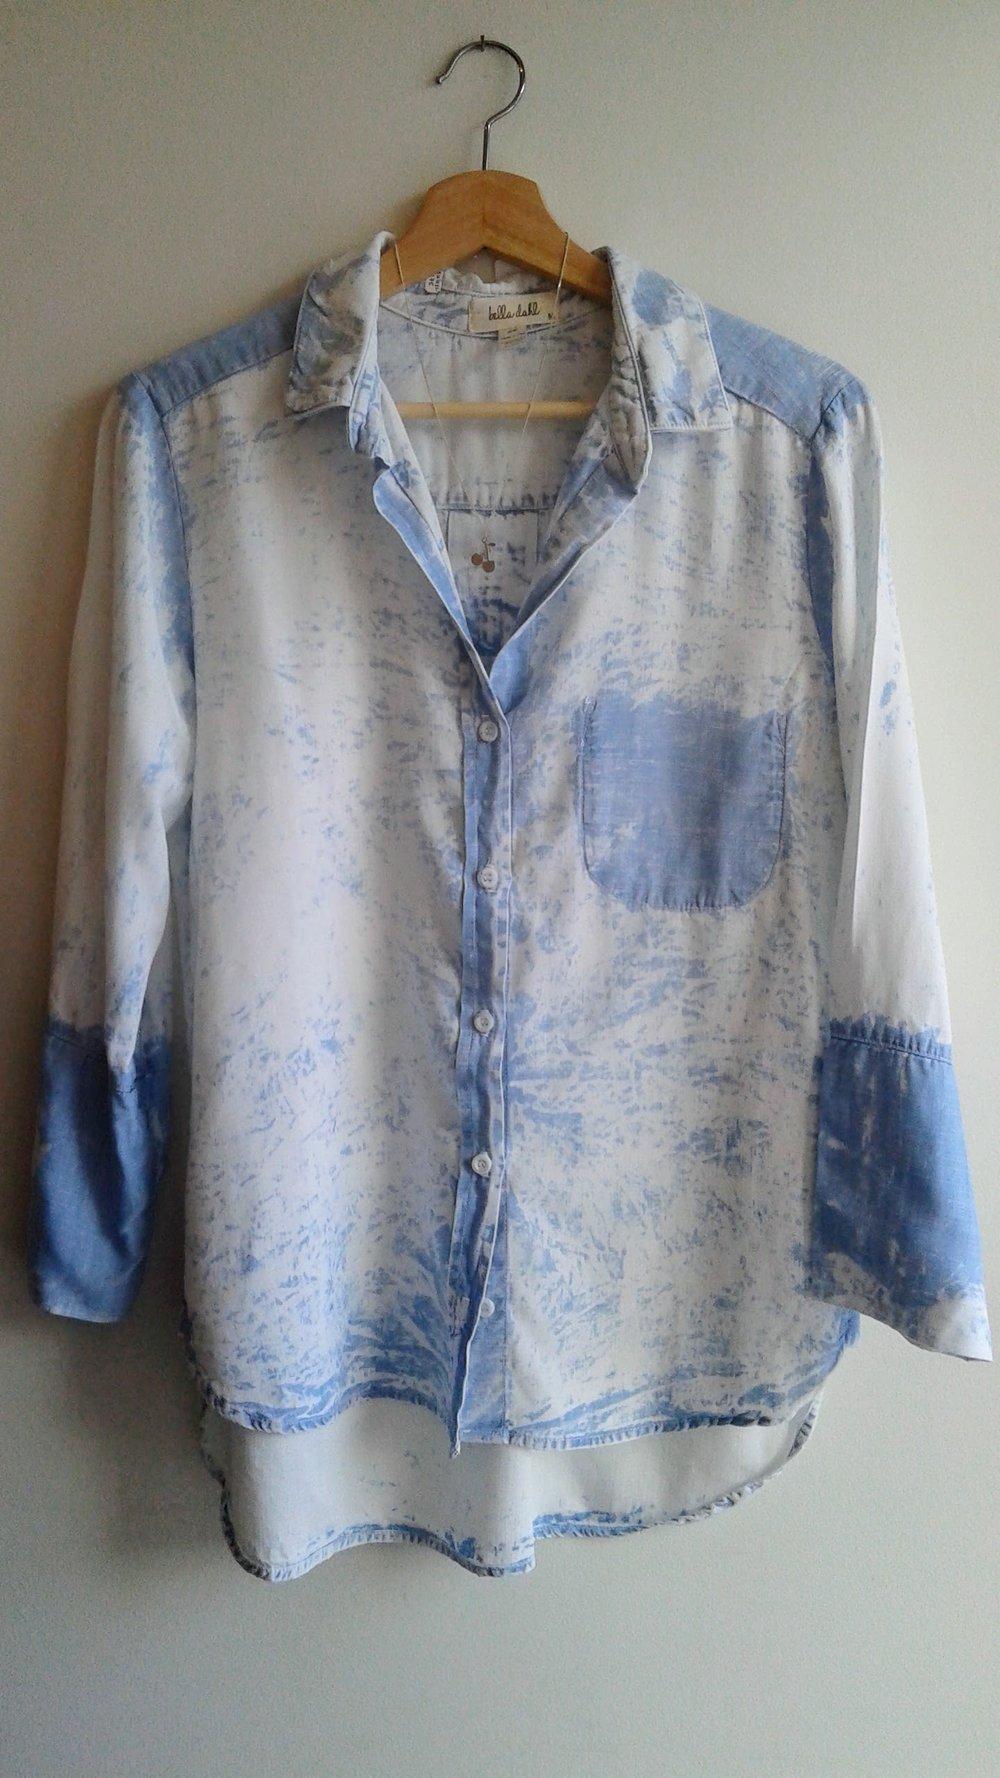 Bella Dahl  top; Size M, $30